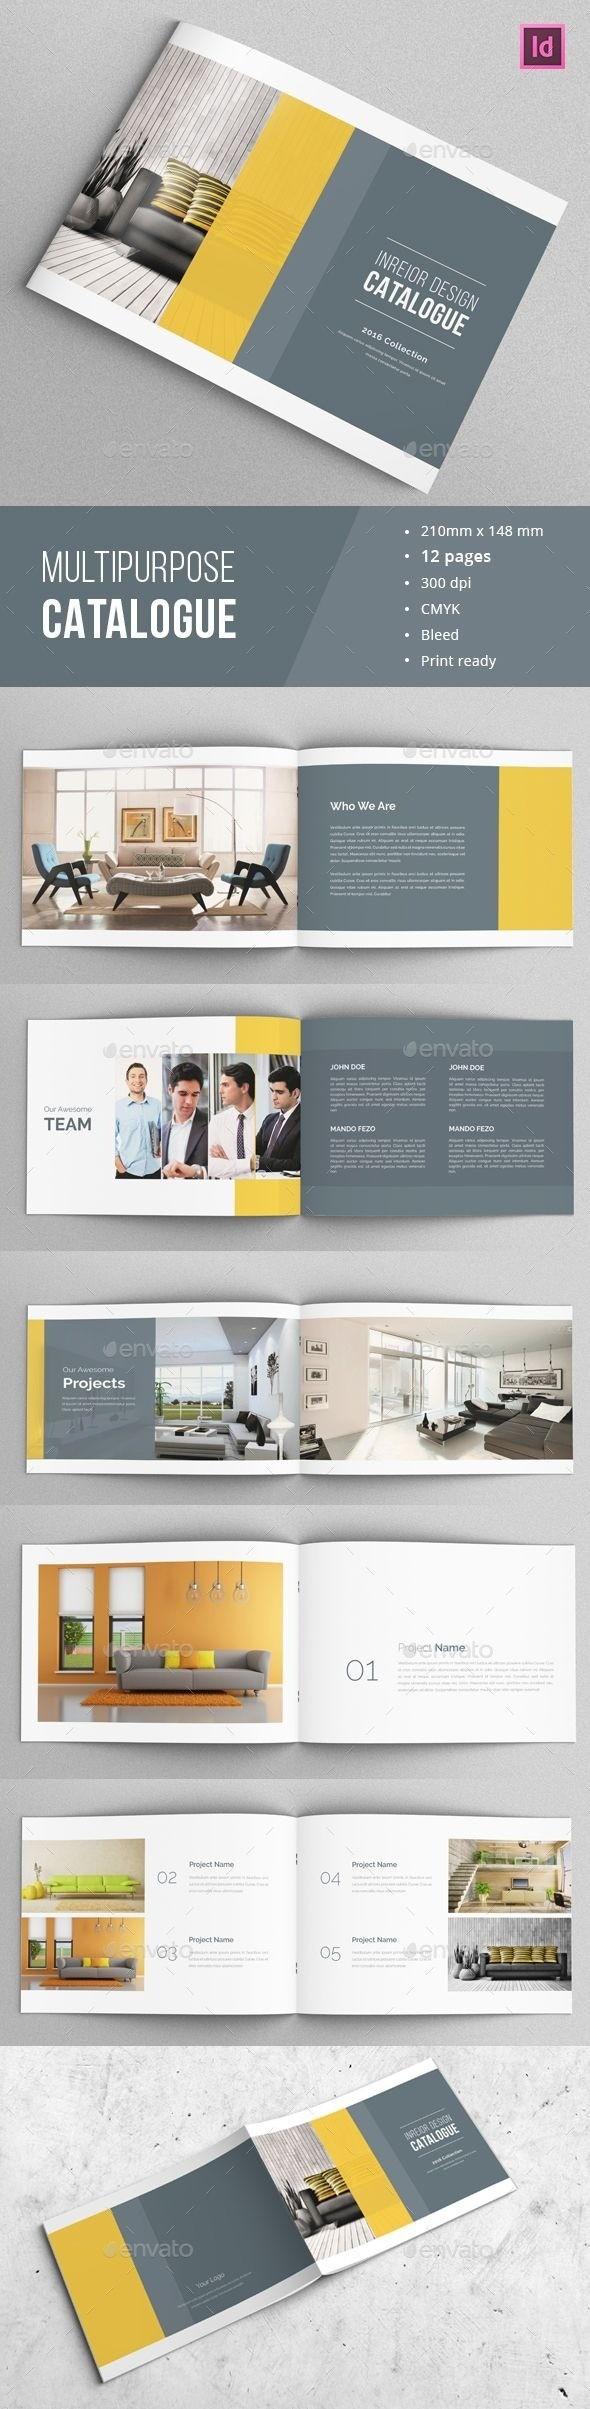 Multipurpose Brochure / Catalogue Template This Is 12 Page Throughout 12 Page Brochure Template